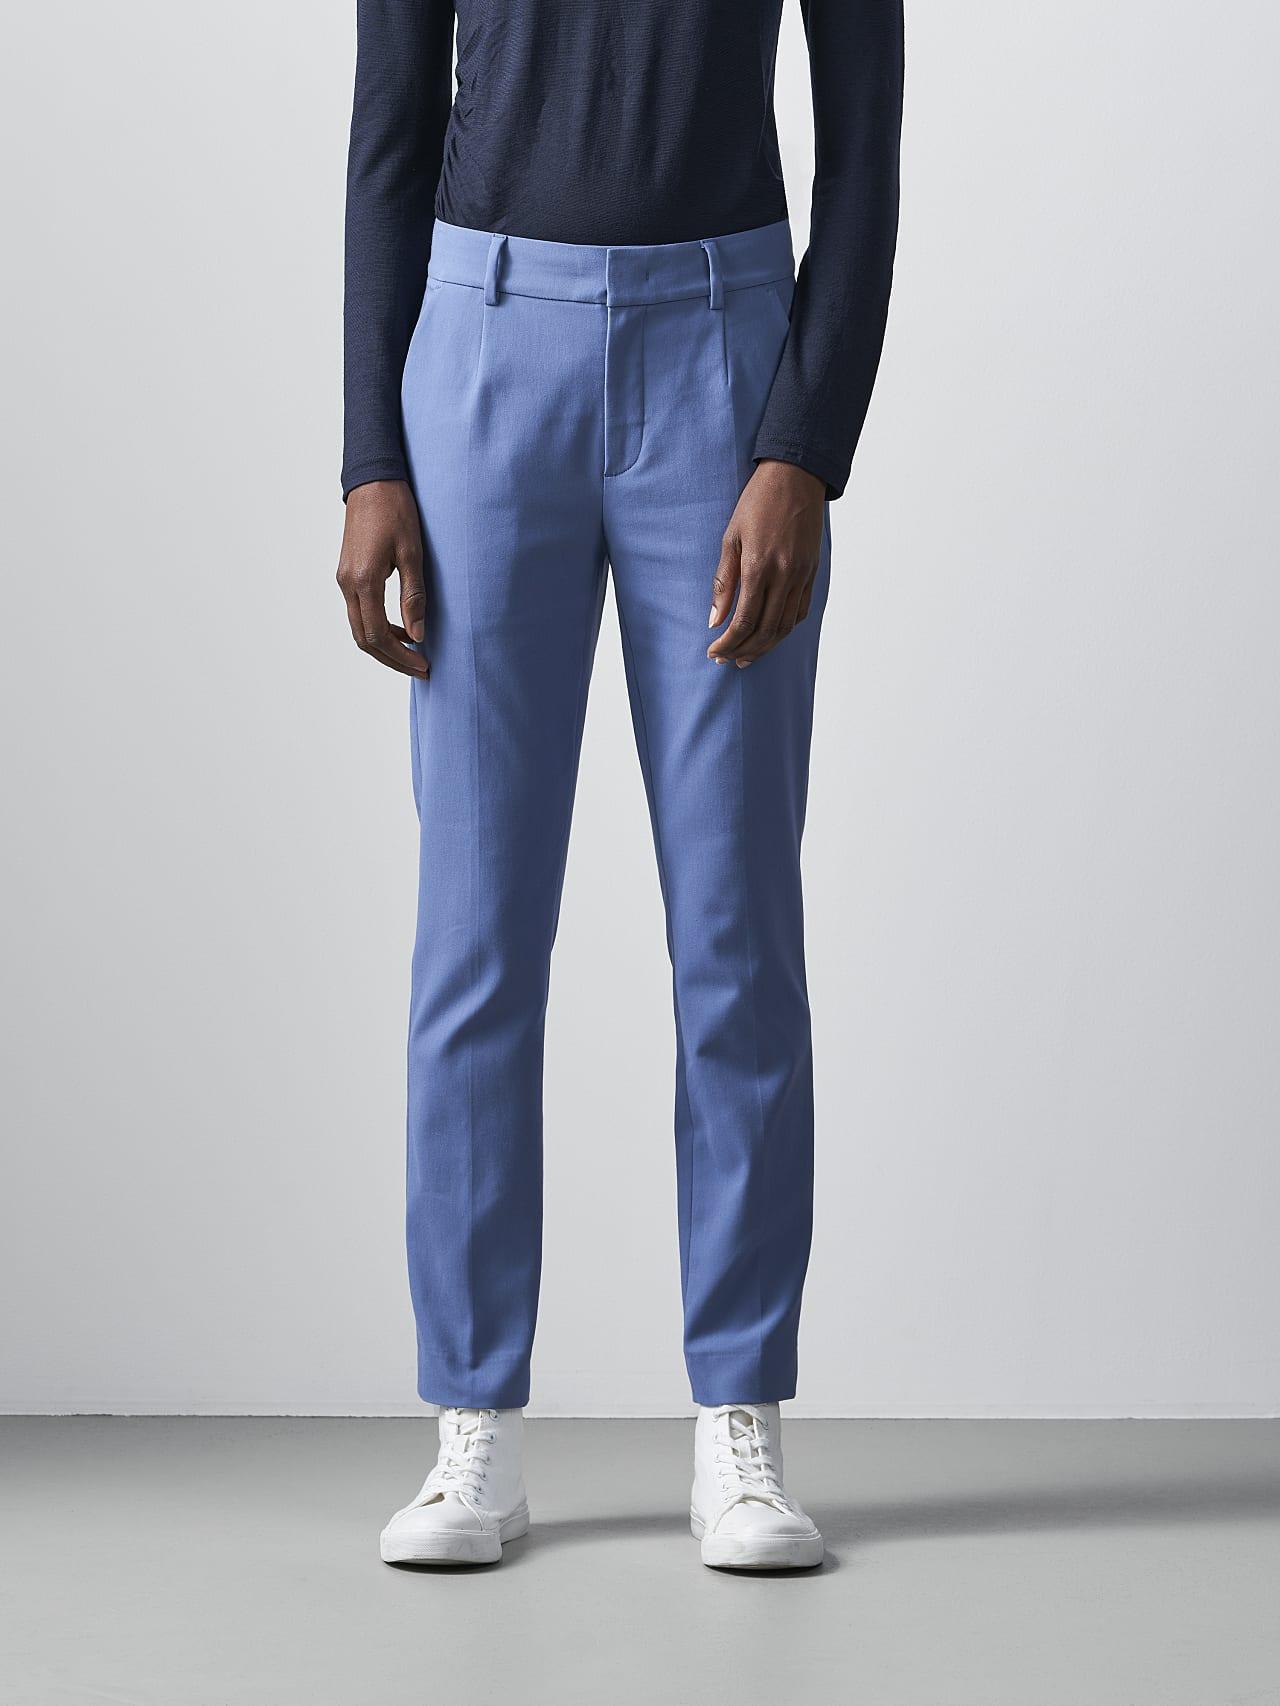 PERTI V1.Y5.02 Slim-Fit Tapered Pants light blue Model shot Alpha Tauri